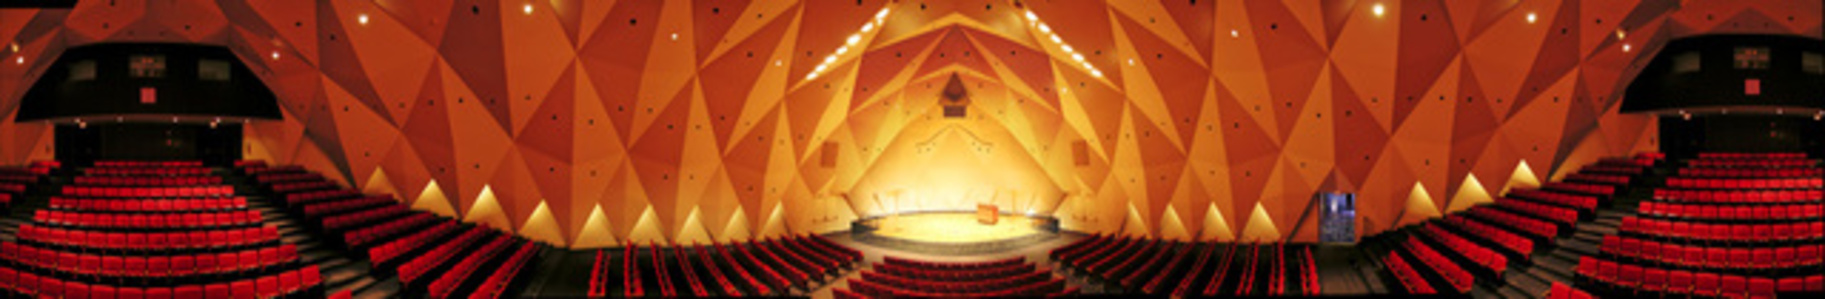 The Auditorium: National Academy of Sciences, Washington DC